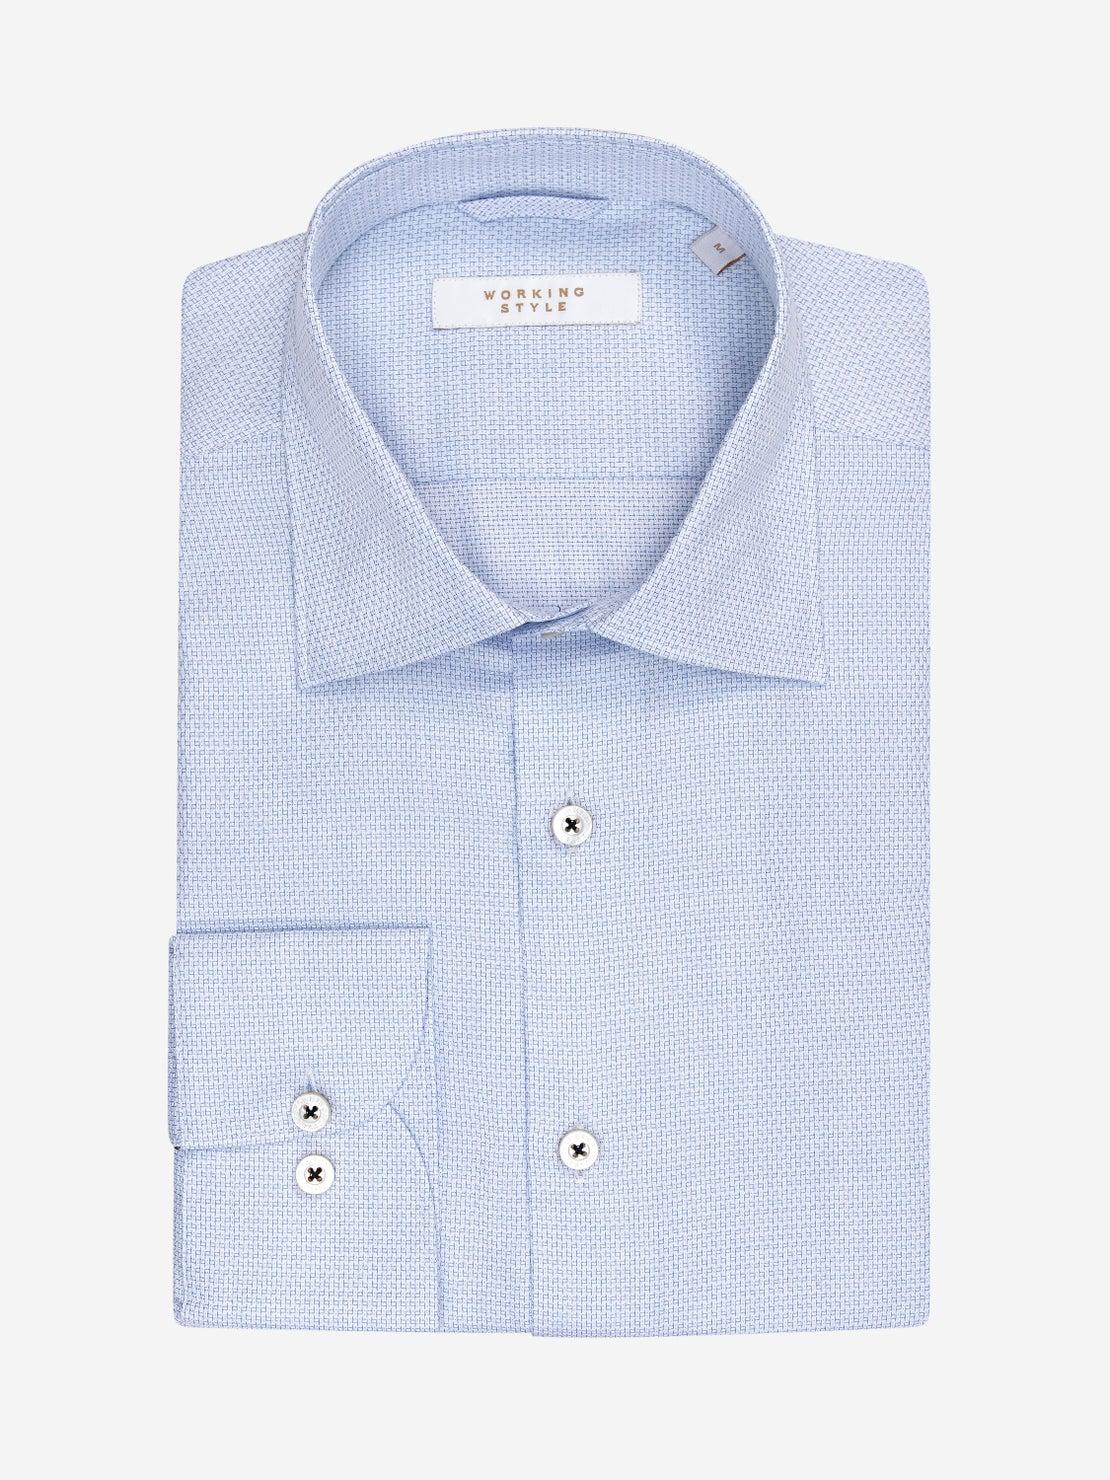 White & Blue Woven Shirt